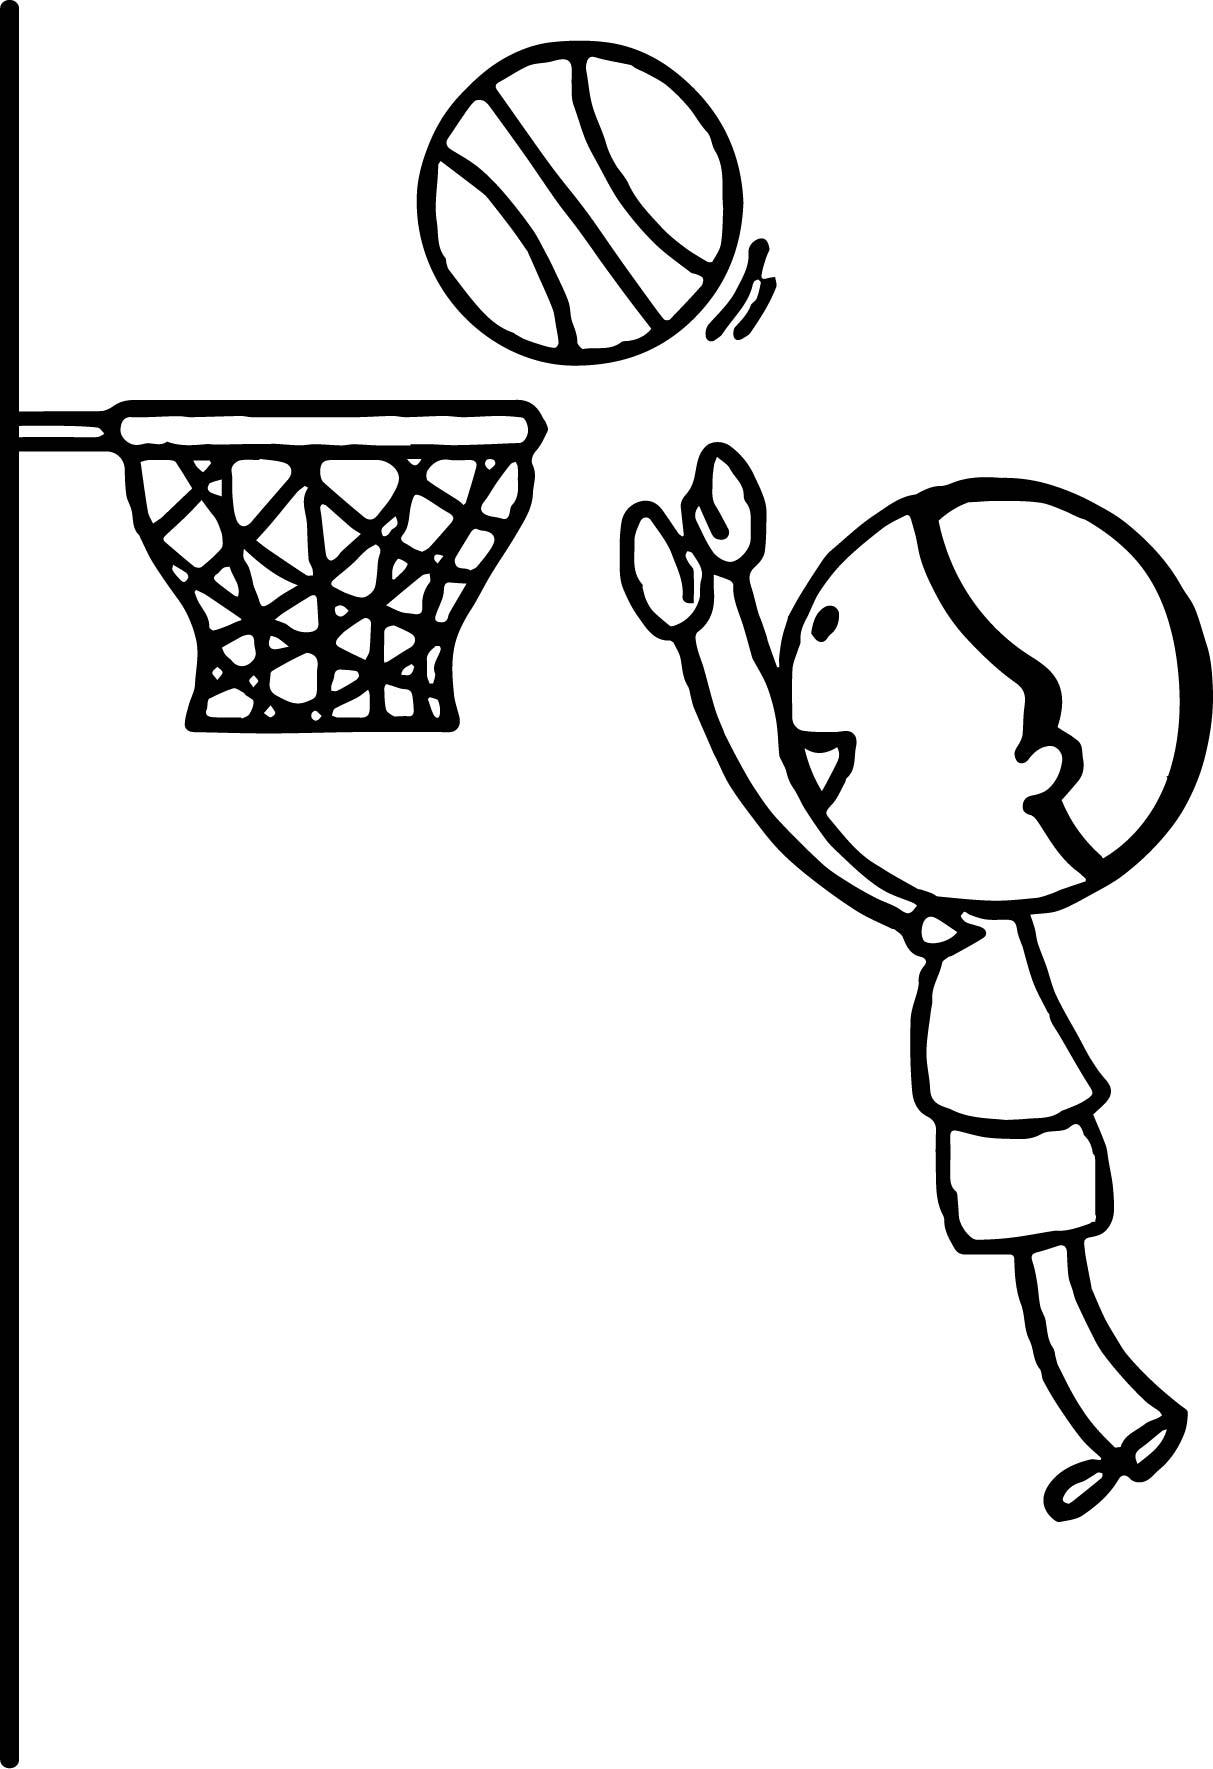 Boy Playing Basketball Jumping To Hoop Playing Basketball